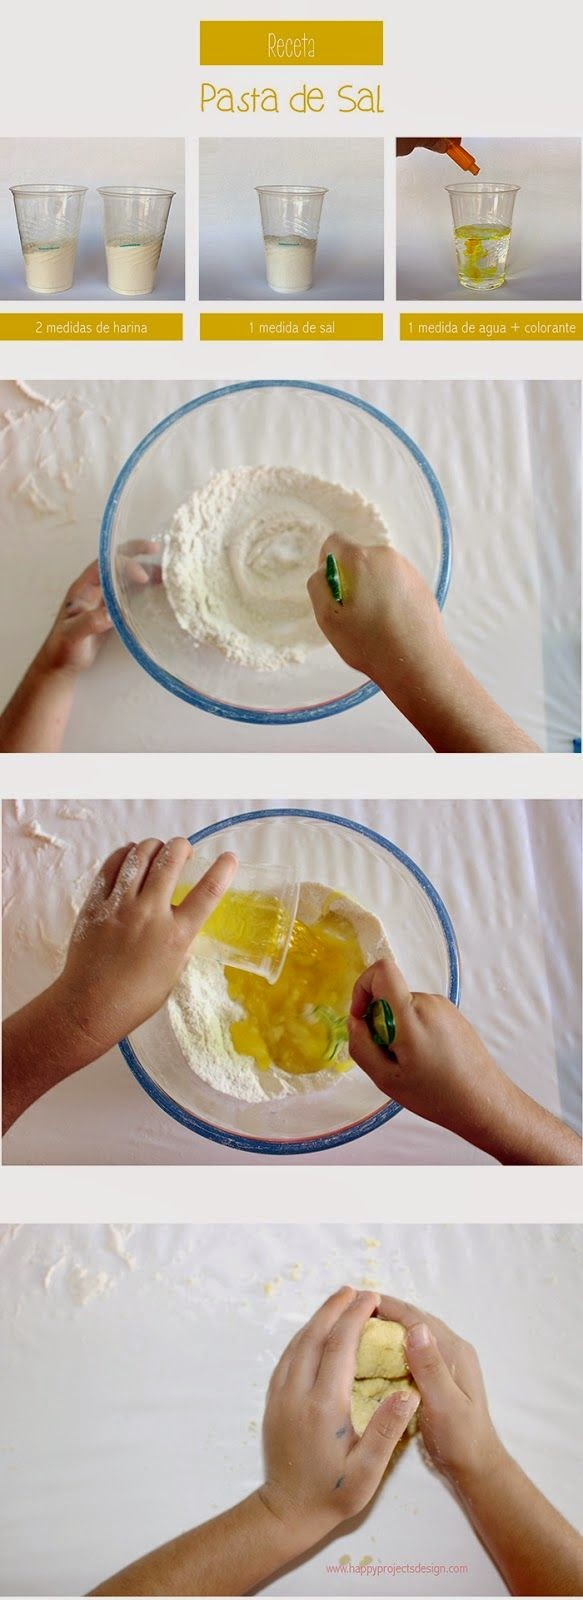 pasta de sal harina agua manualidades